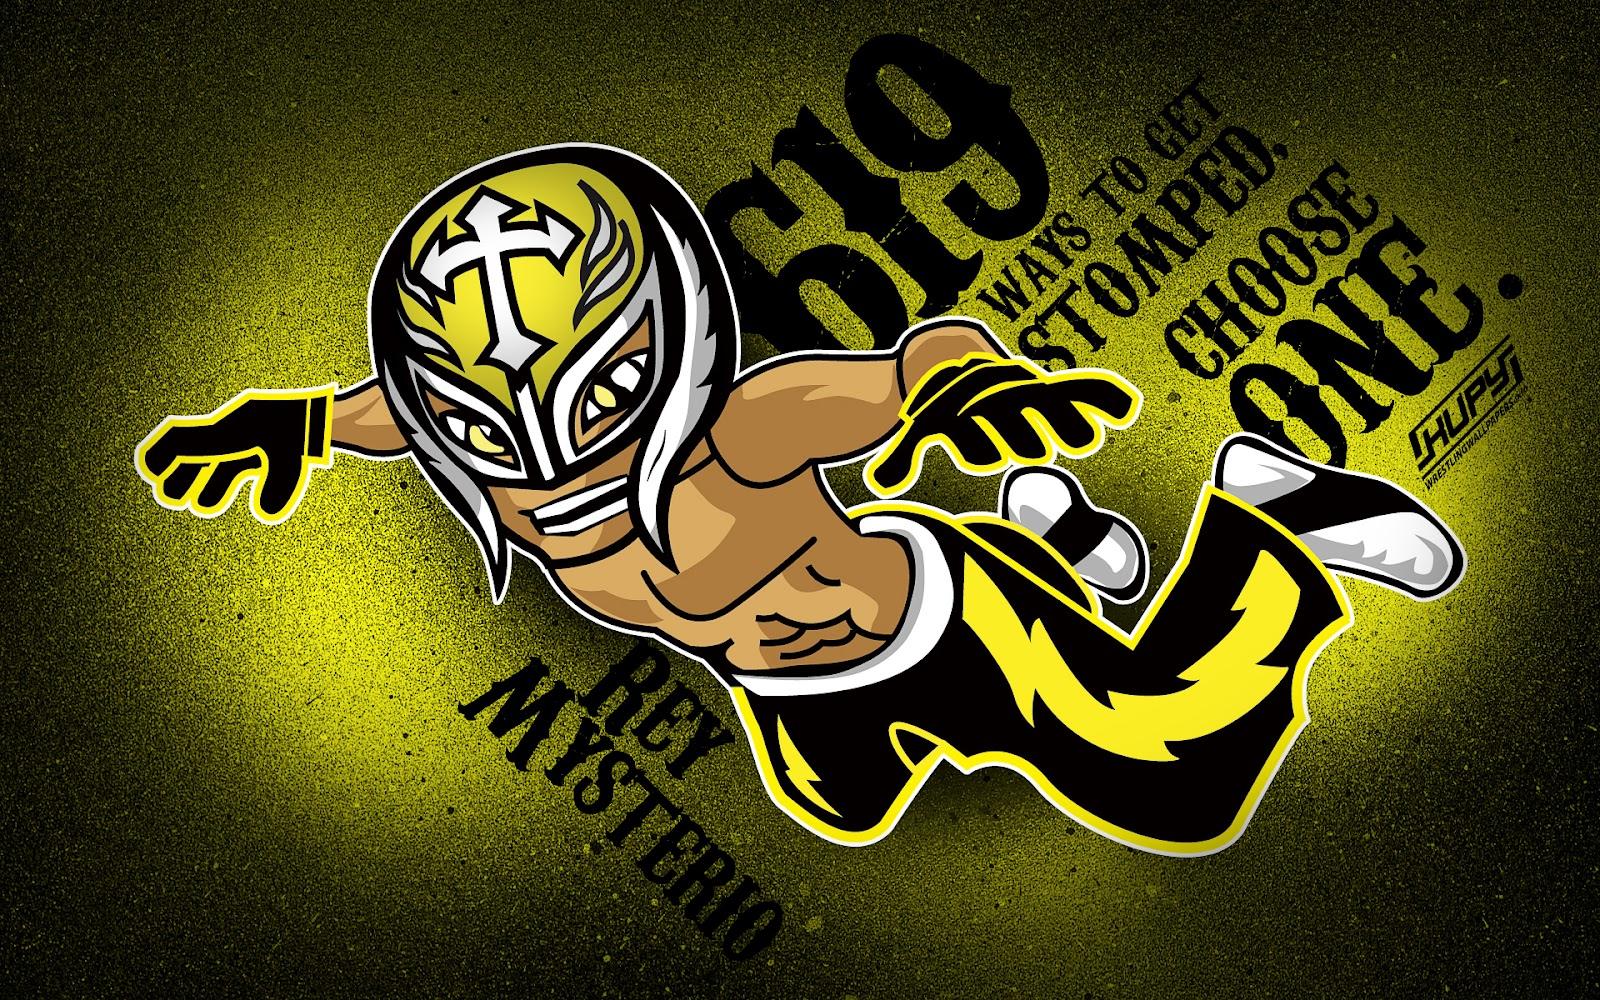 http://1.bp.blogspot.com/-_VNJ0kDS7UE/T5PqwAOYrEI/AAAAAAAAHuY/aEwWO2iYBLs/s1600/rey_mysterio_619_wallpaper_wwe.jpg